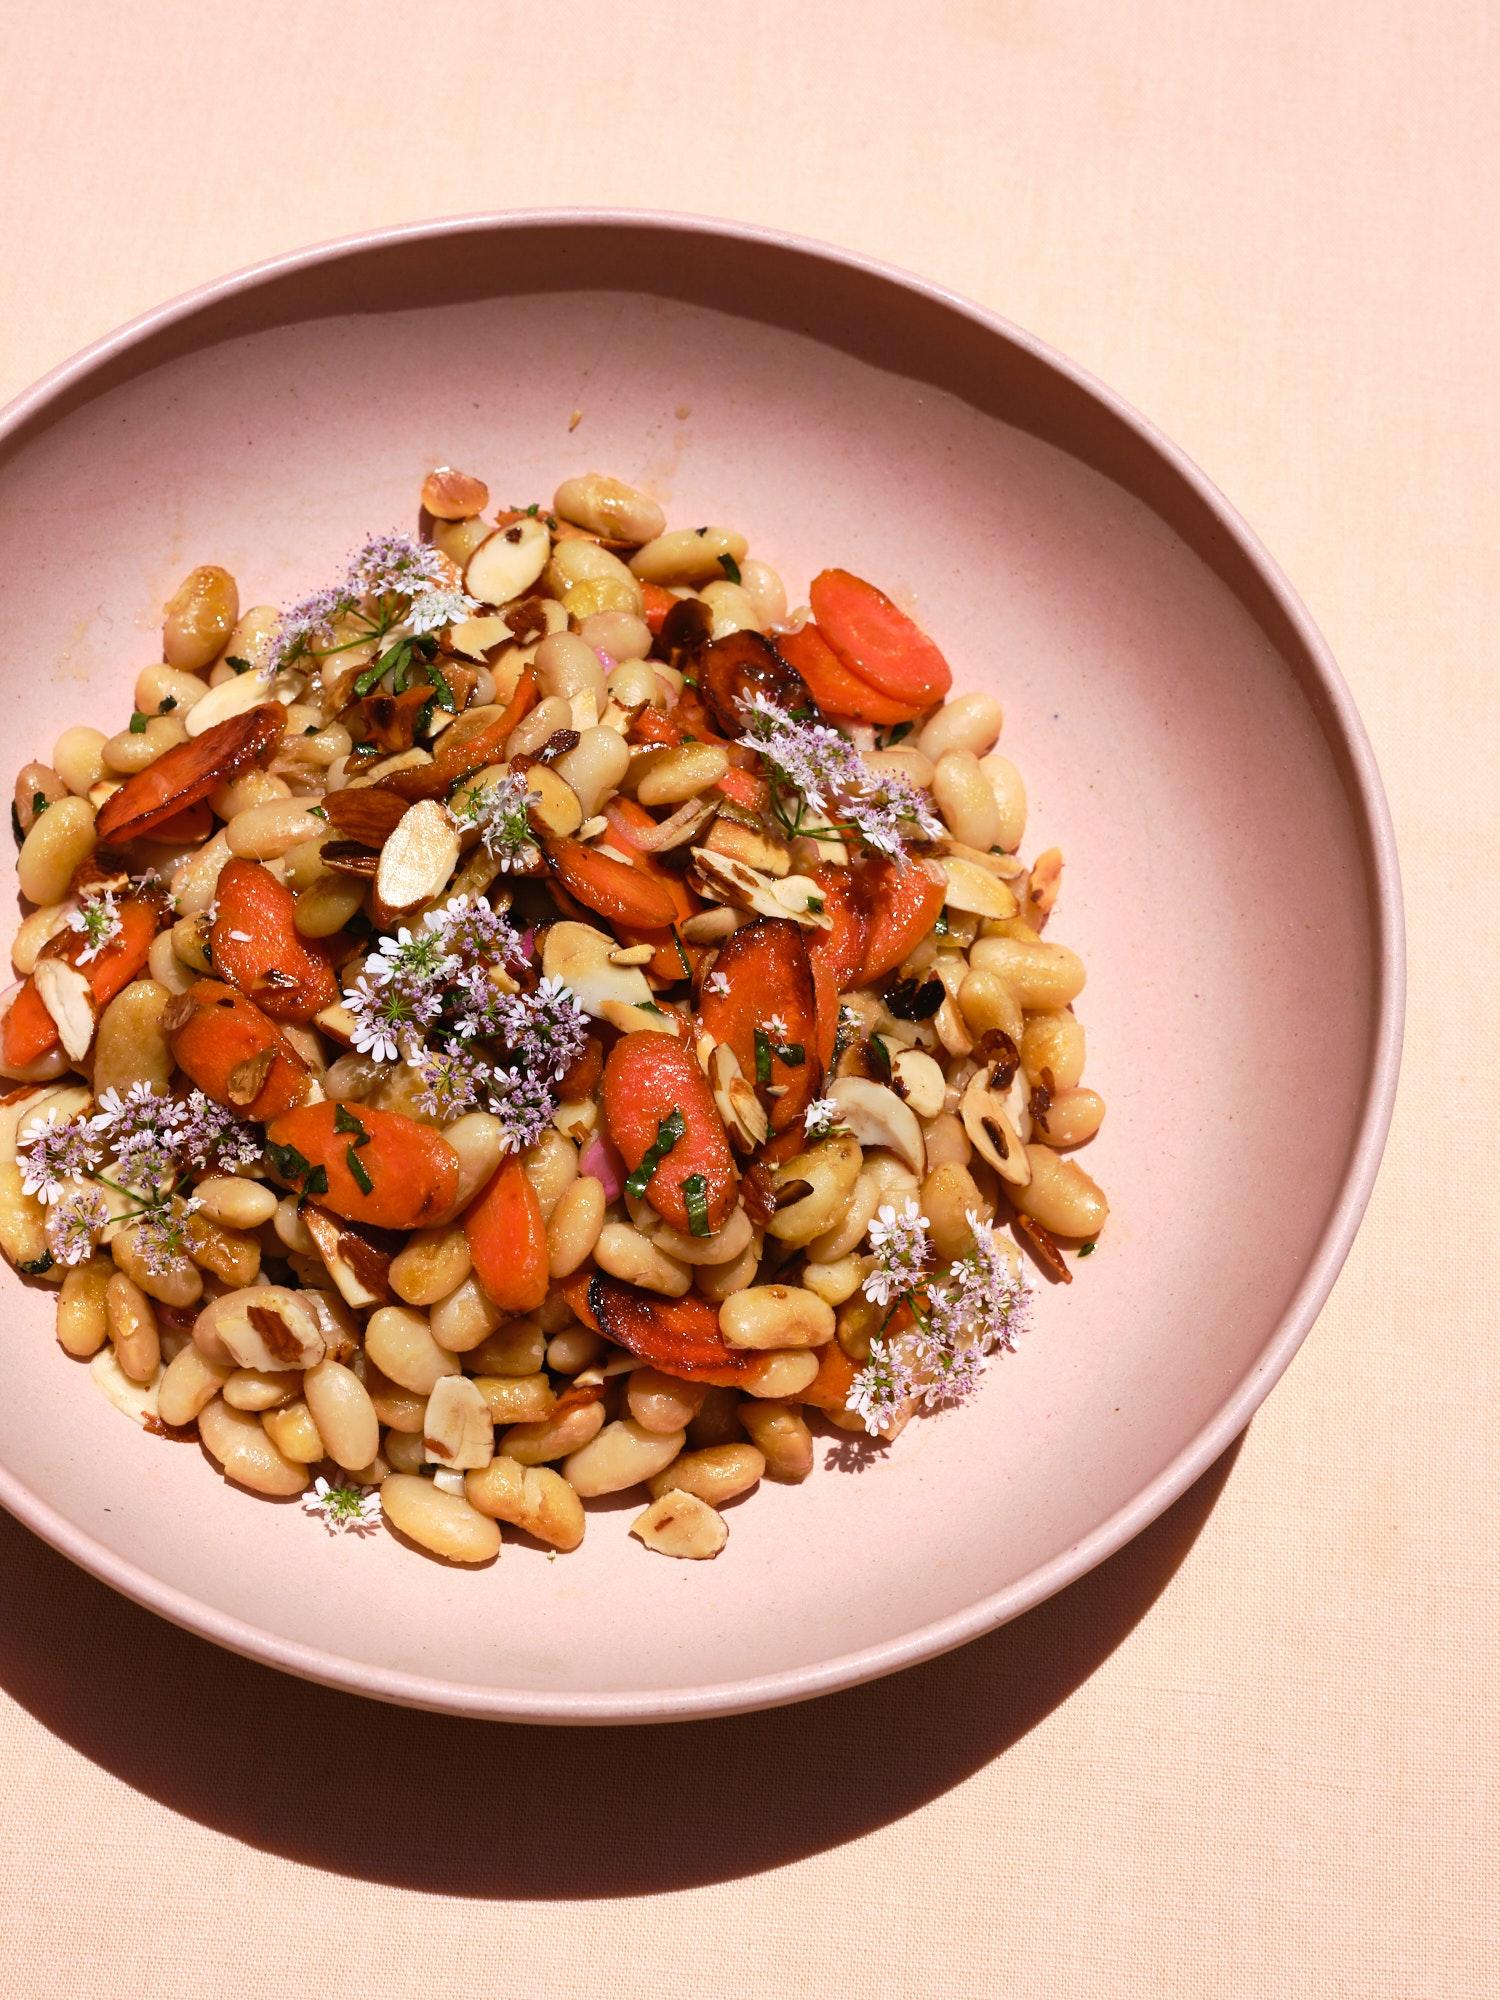 Carrot, Dill White Bean Salad Recipe